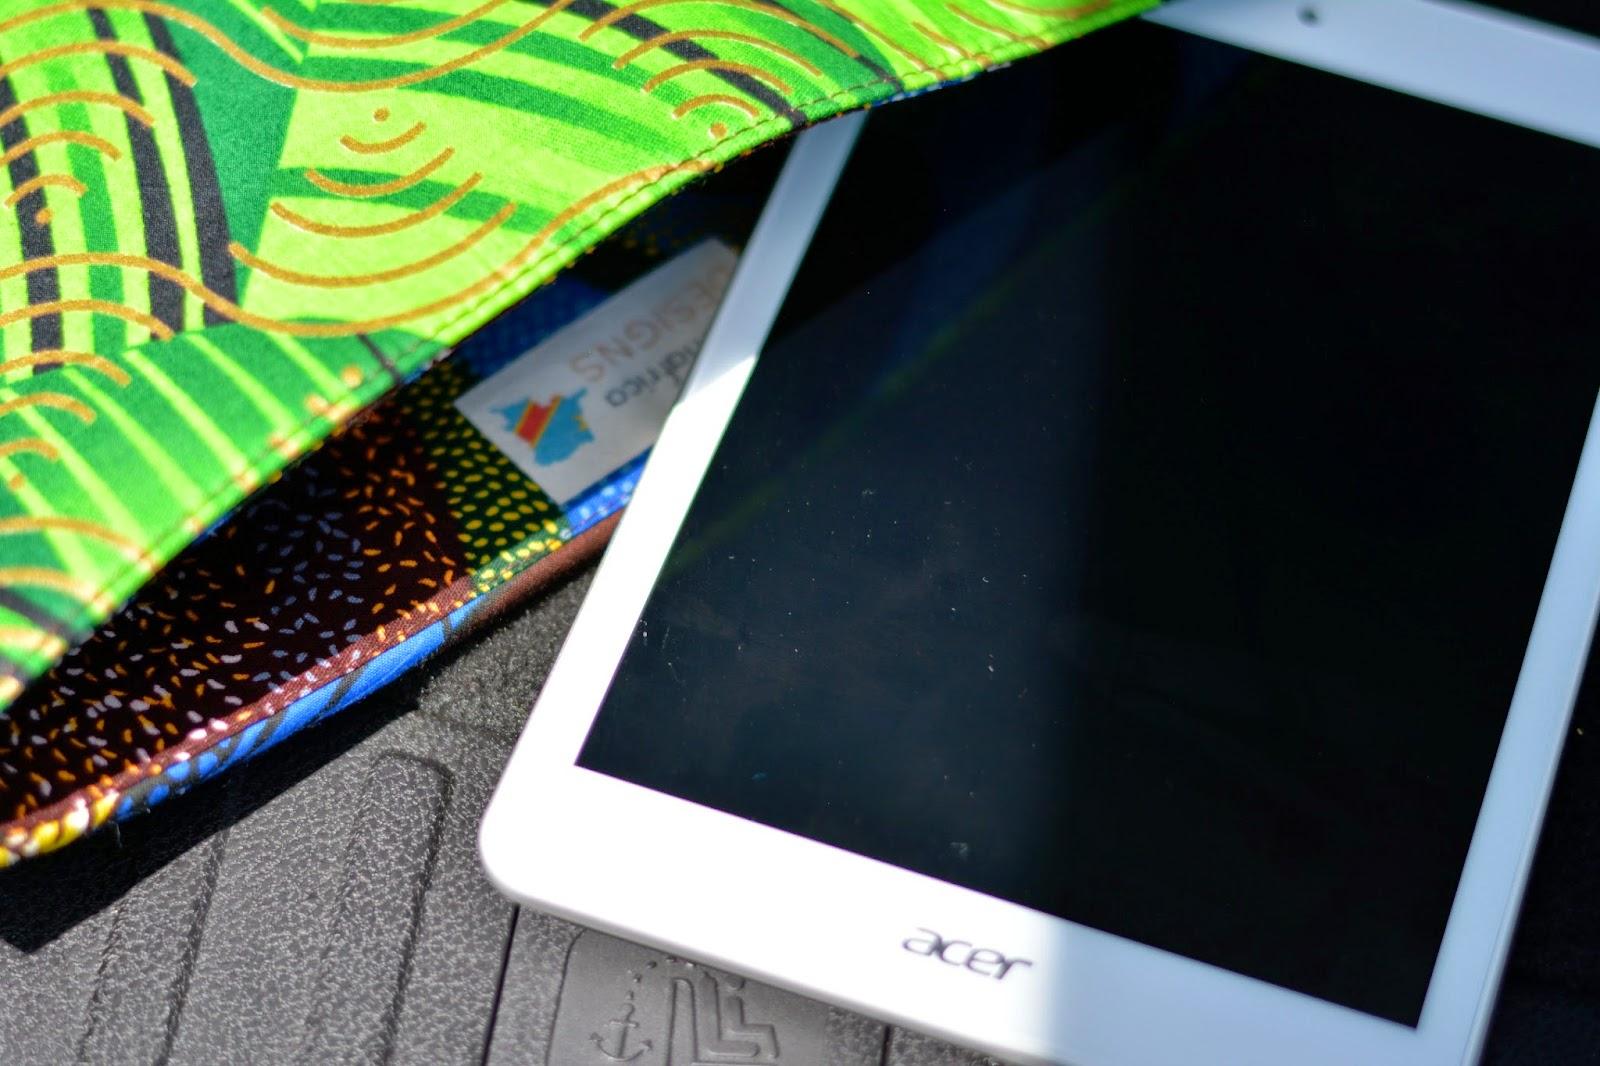 intel tablets #spon